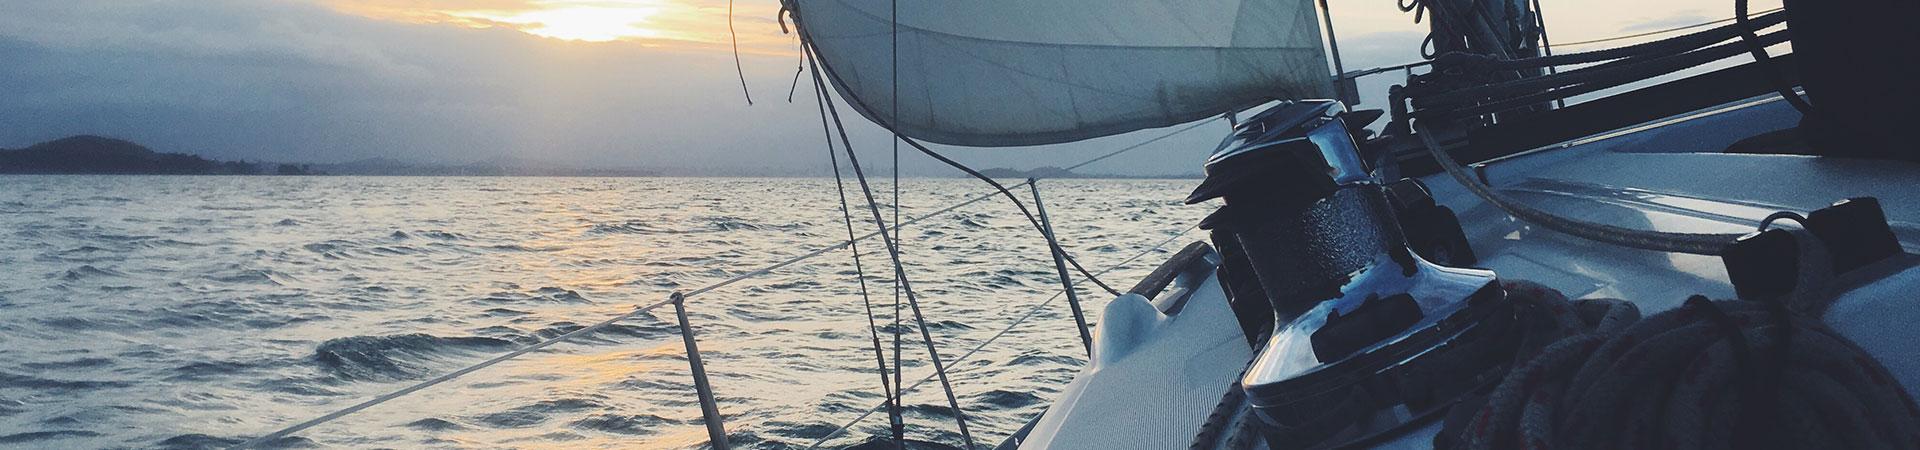 Yachtskipper